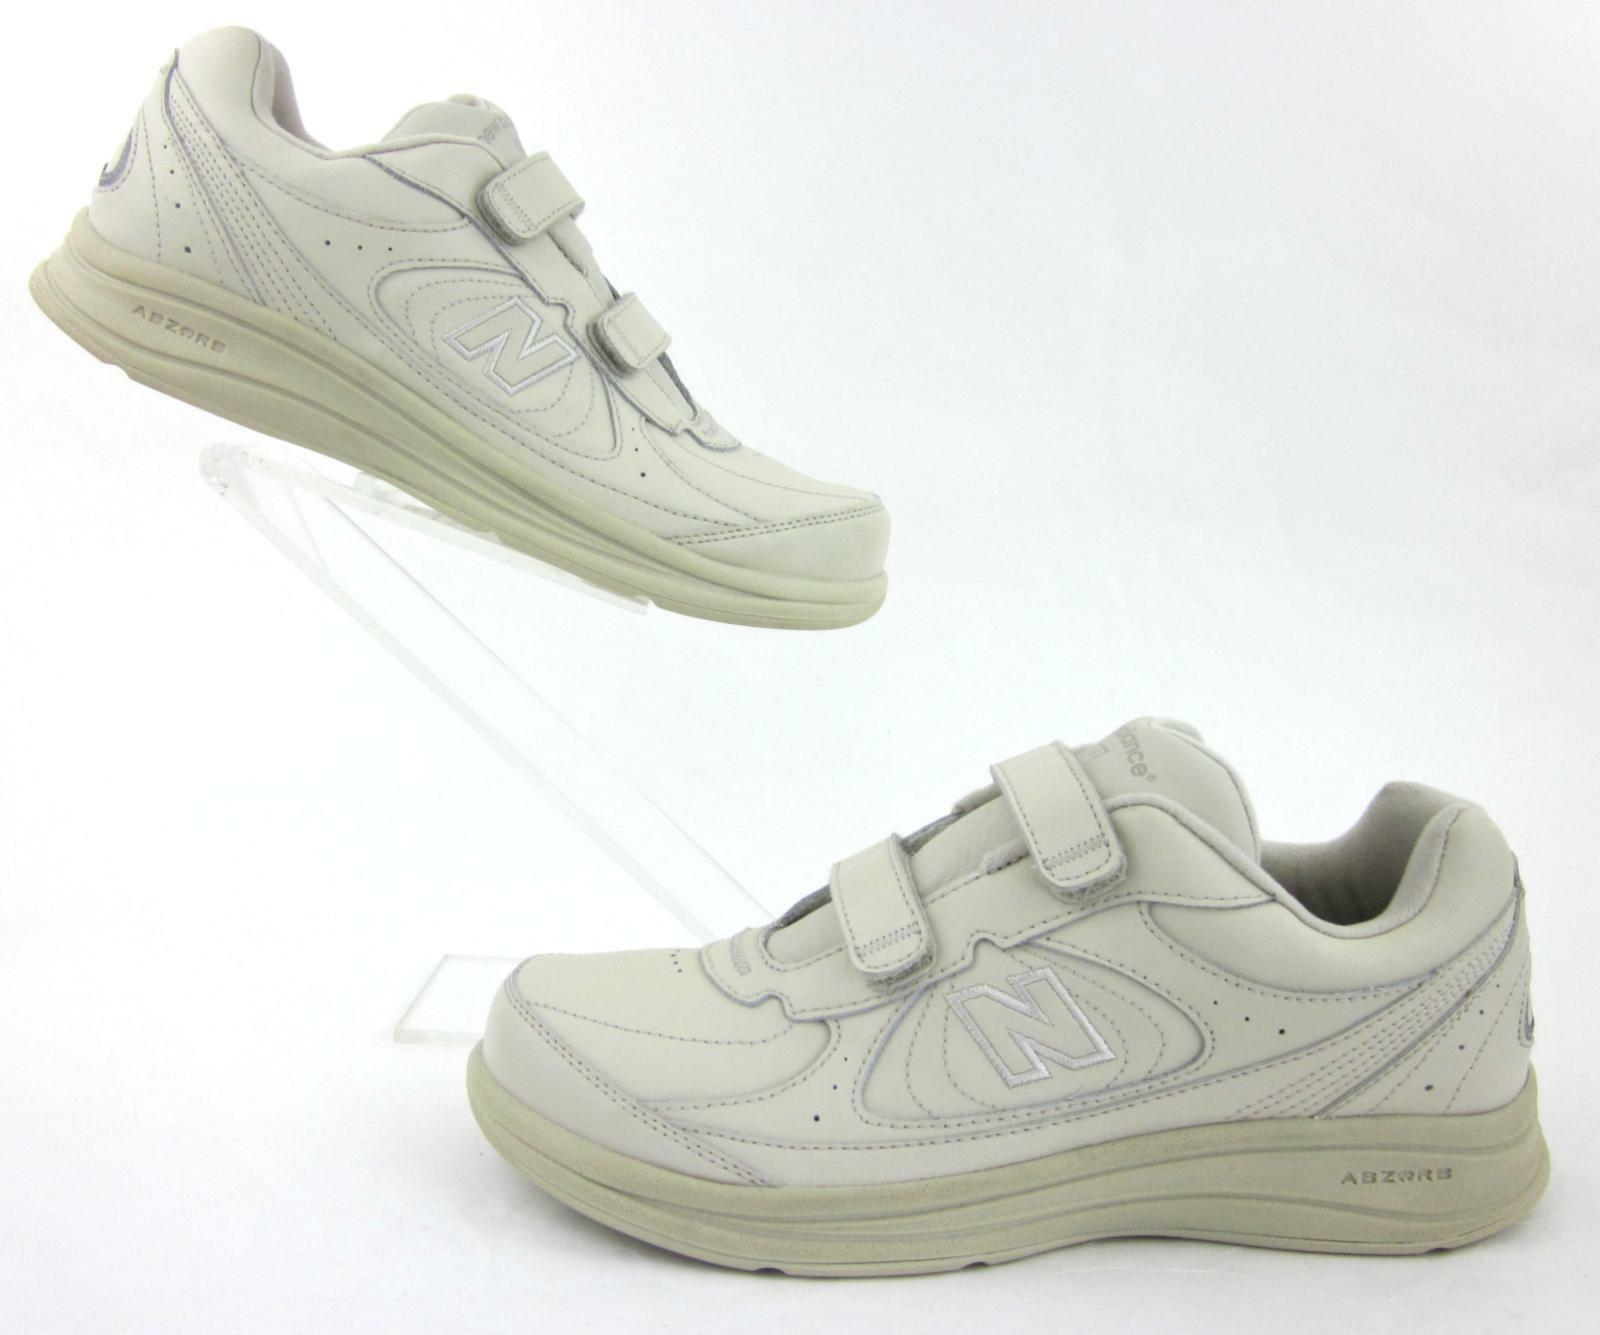 NEW  New Balance 577 Hook & Loop Leather Walking shoes Bone US 10D